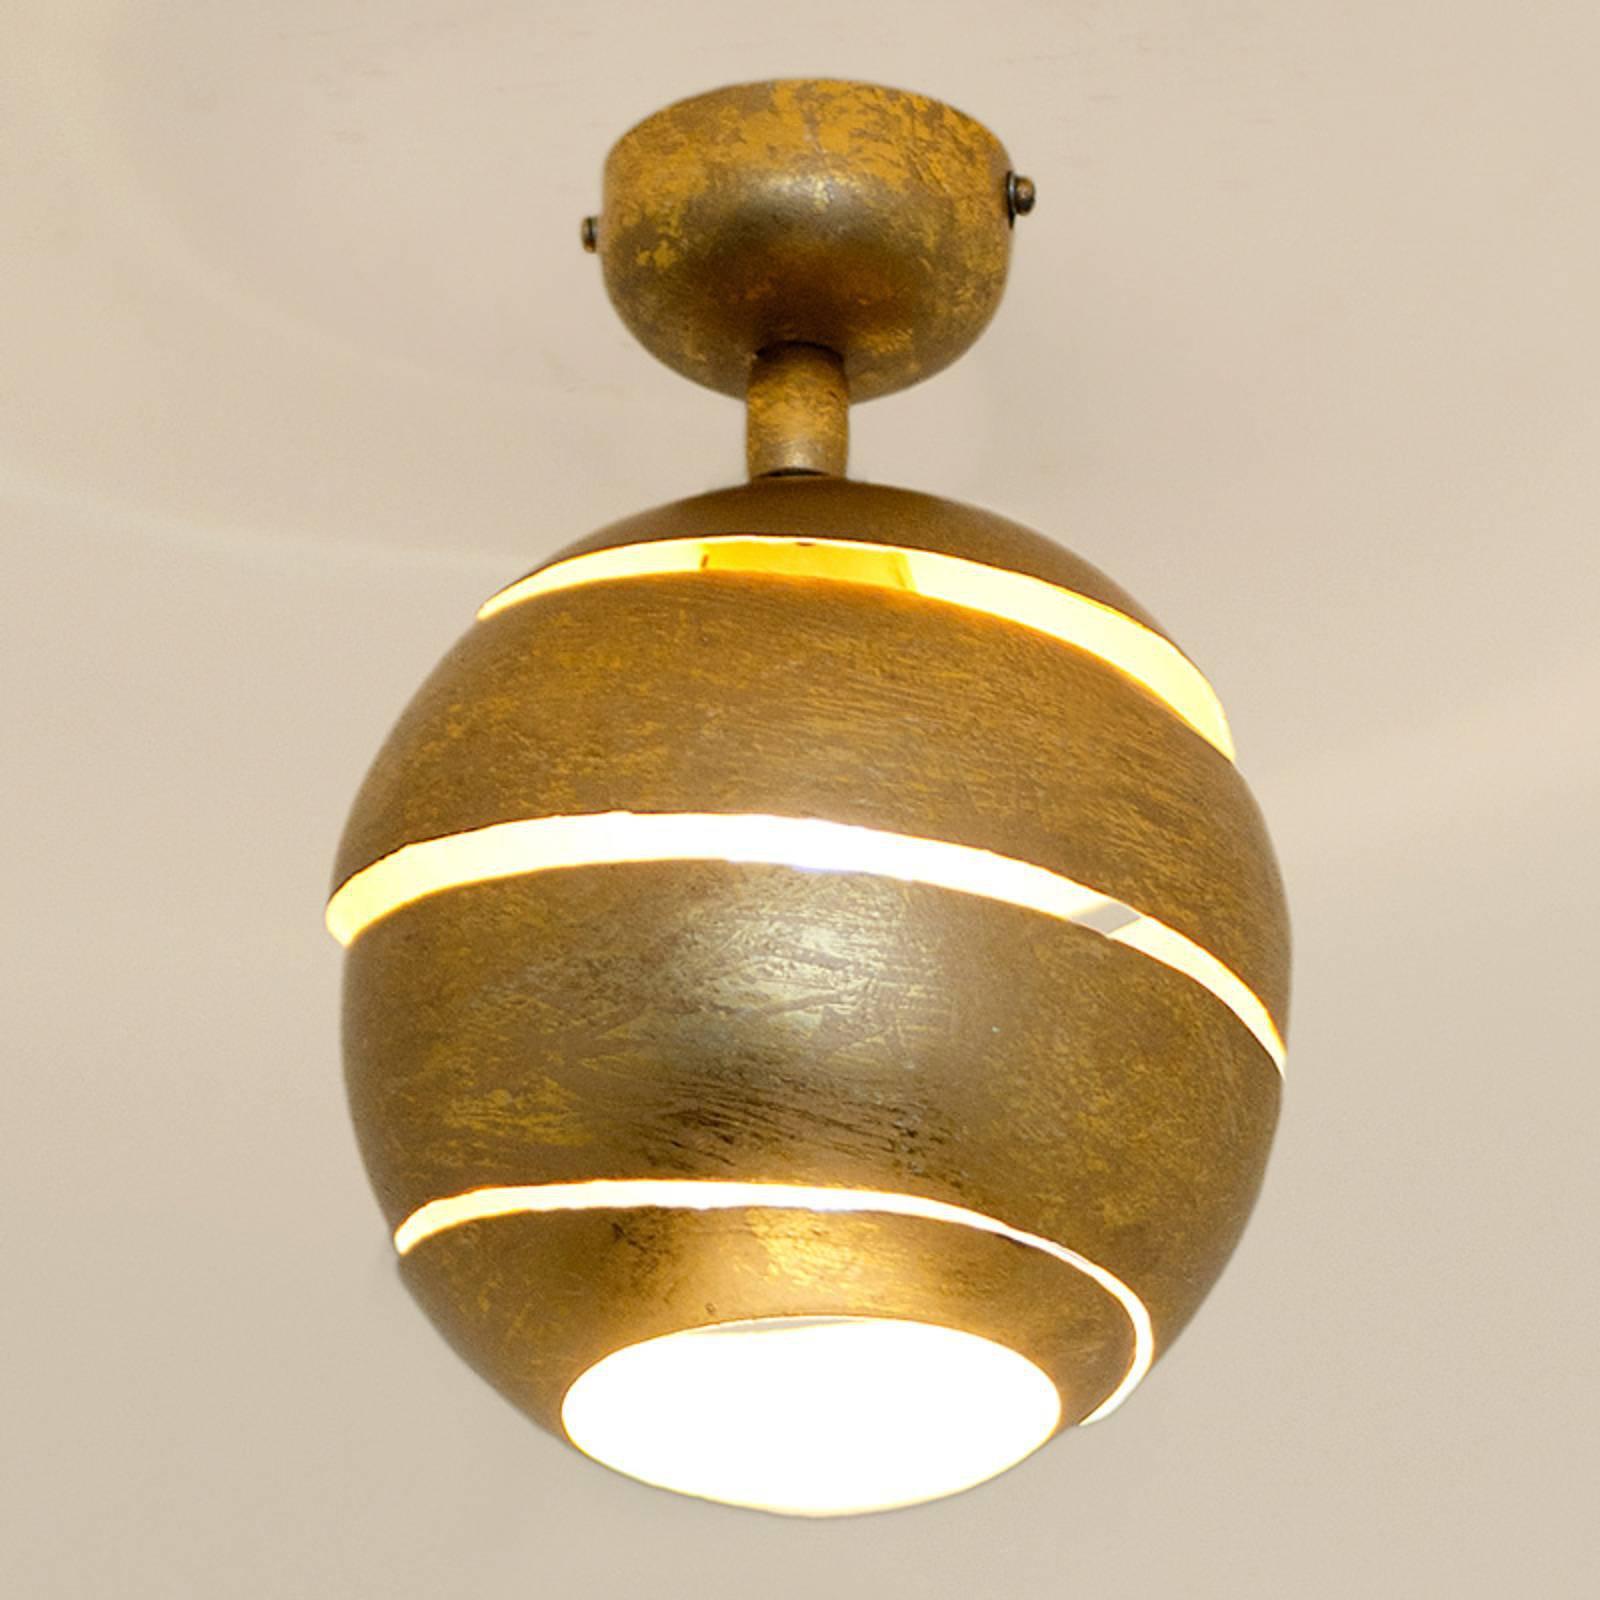 Svingbar taklampe Suopare i gull